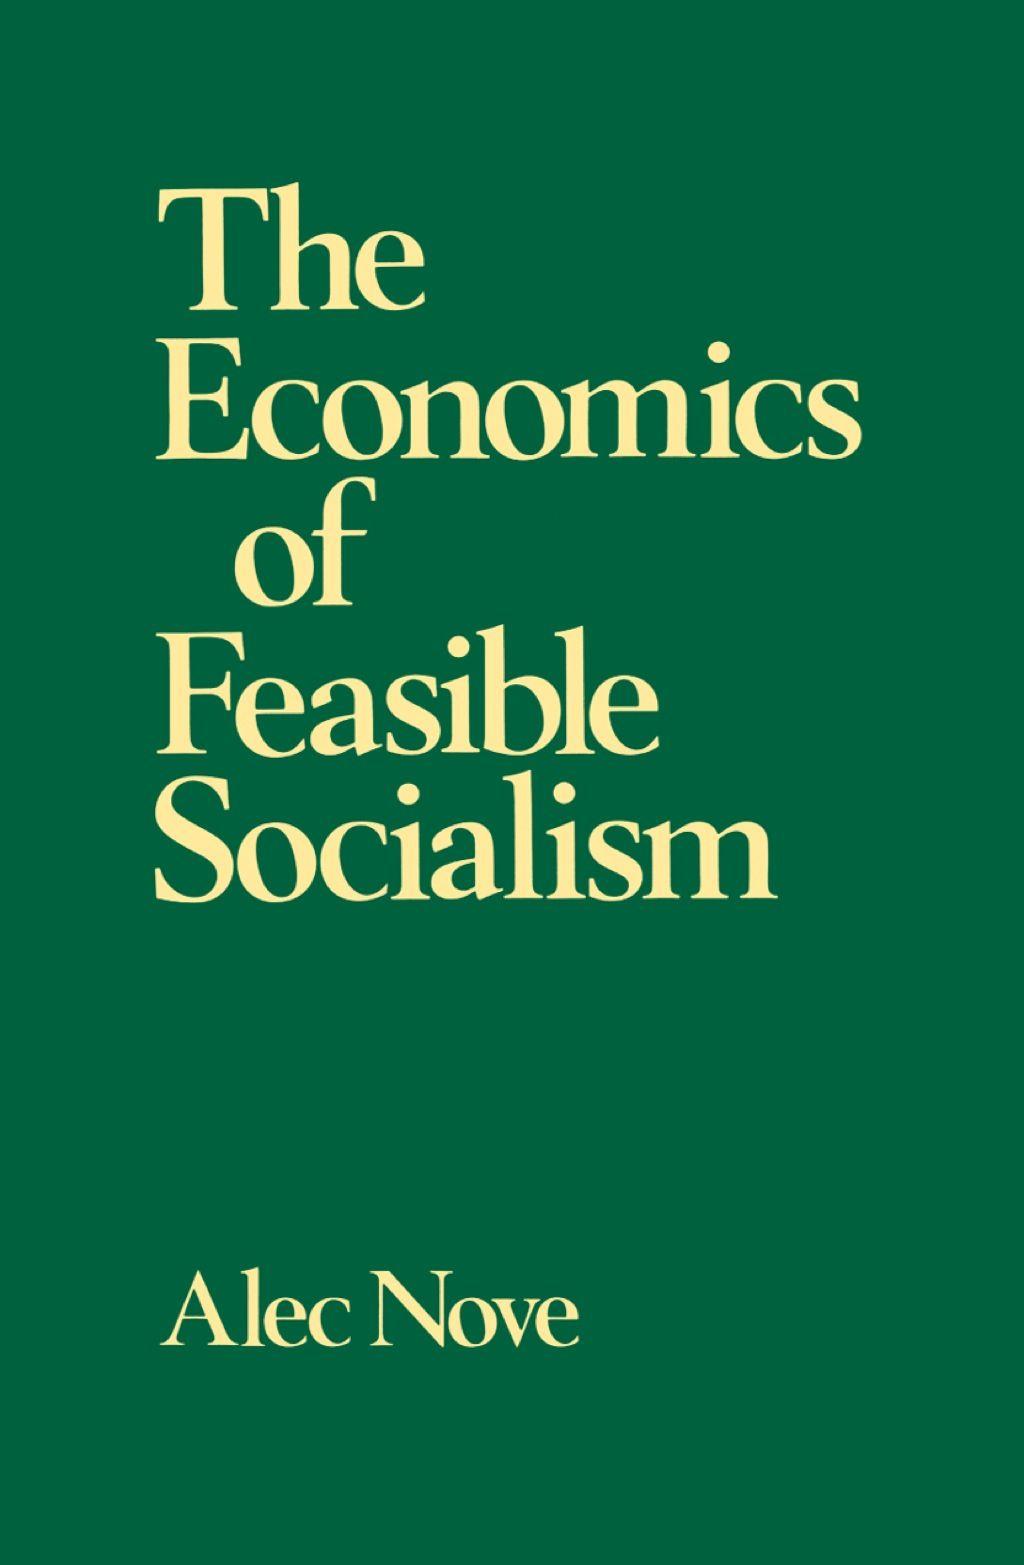 The Economics of Feasible Socialism (eBook Rental